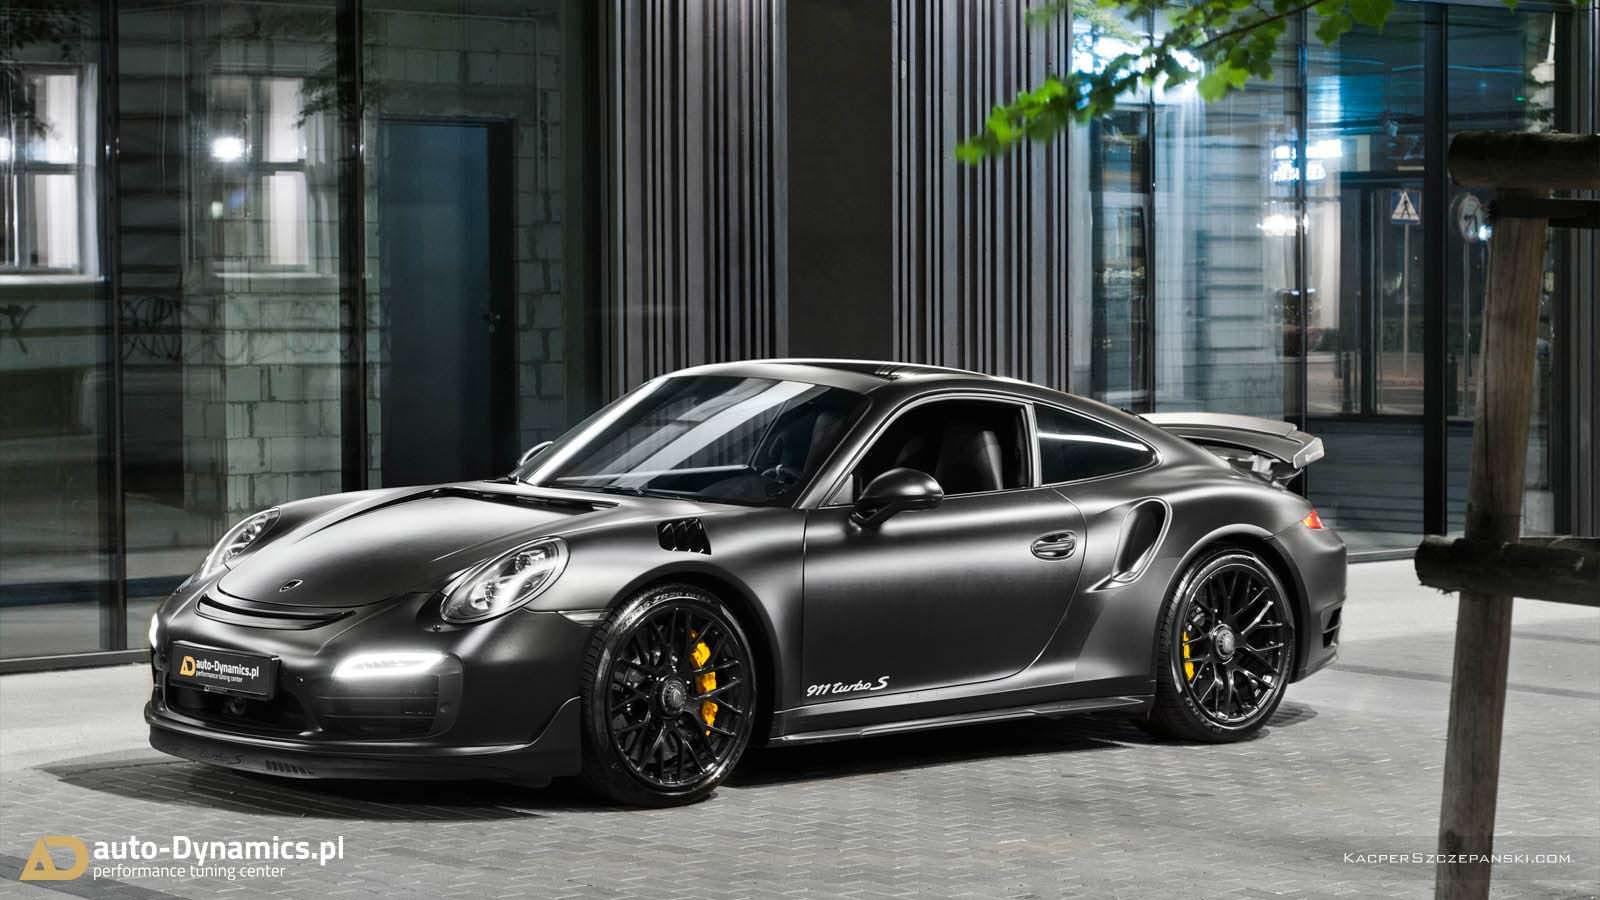 Тюнинг-ателье Auto-Dynamics презентовало модель Порше 911 Turbo S